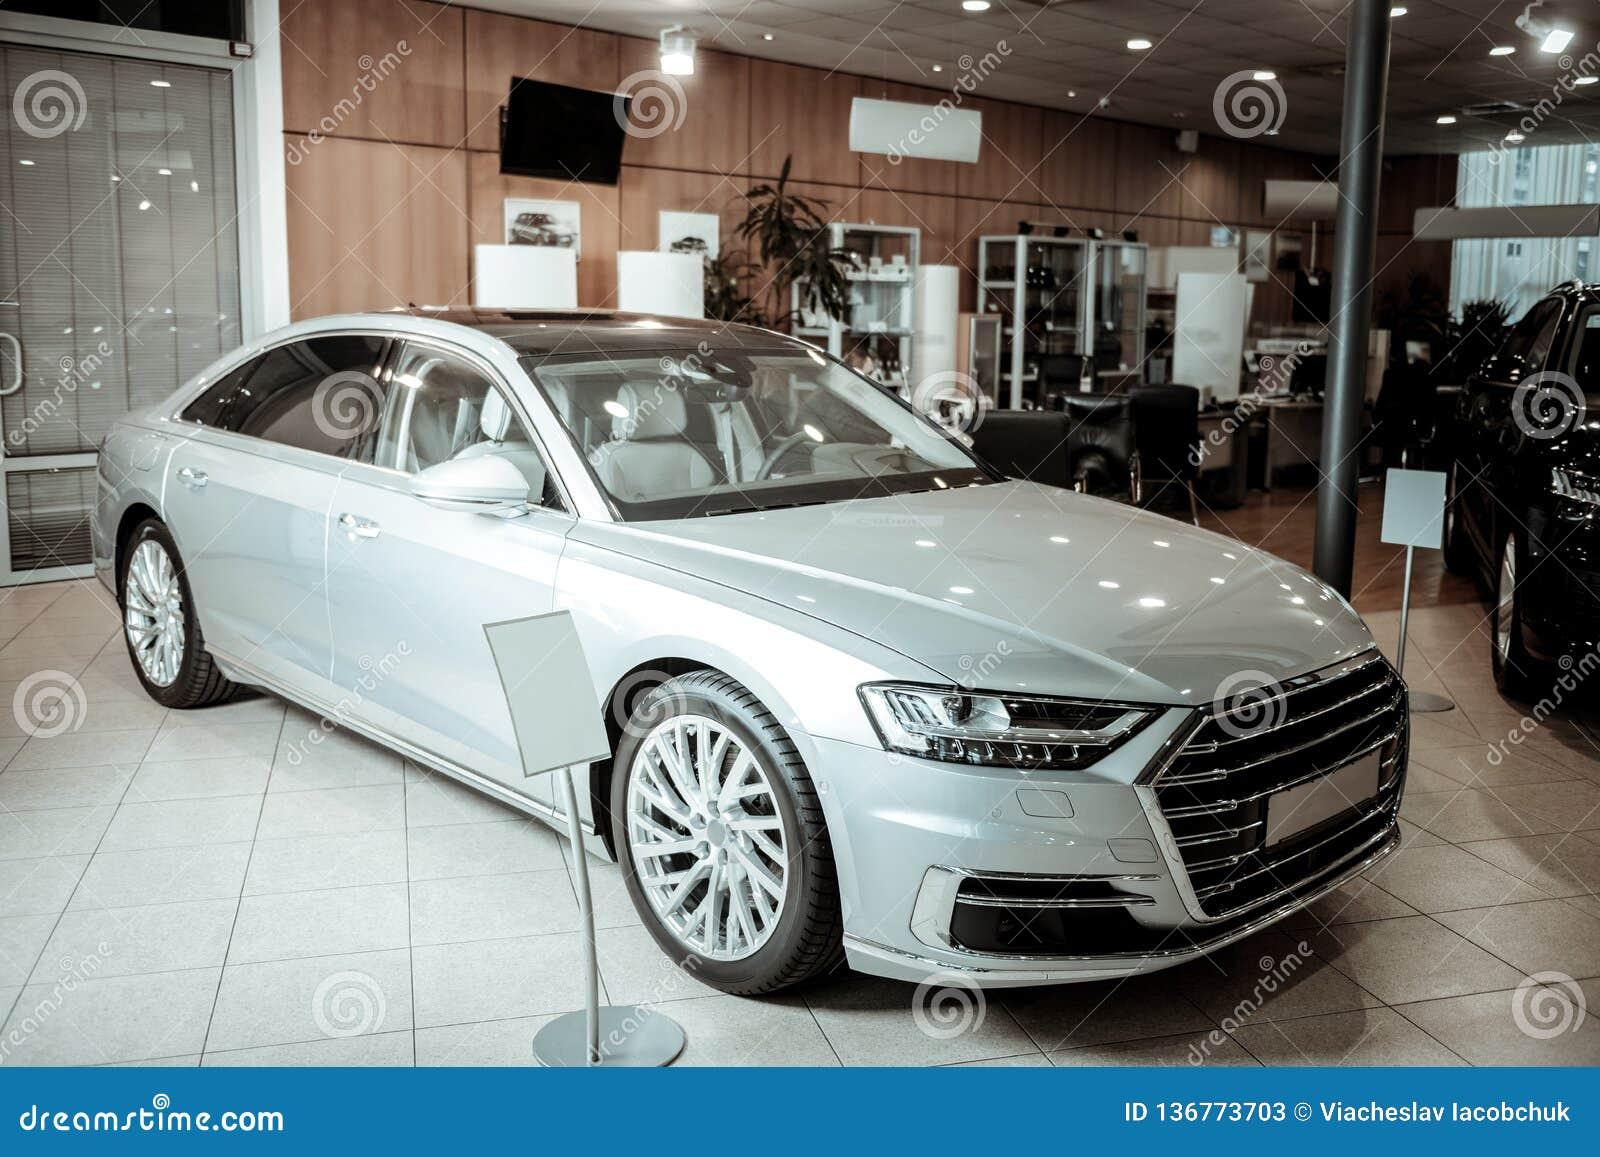 Nice light silver passenger car standing in car dealers